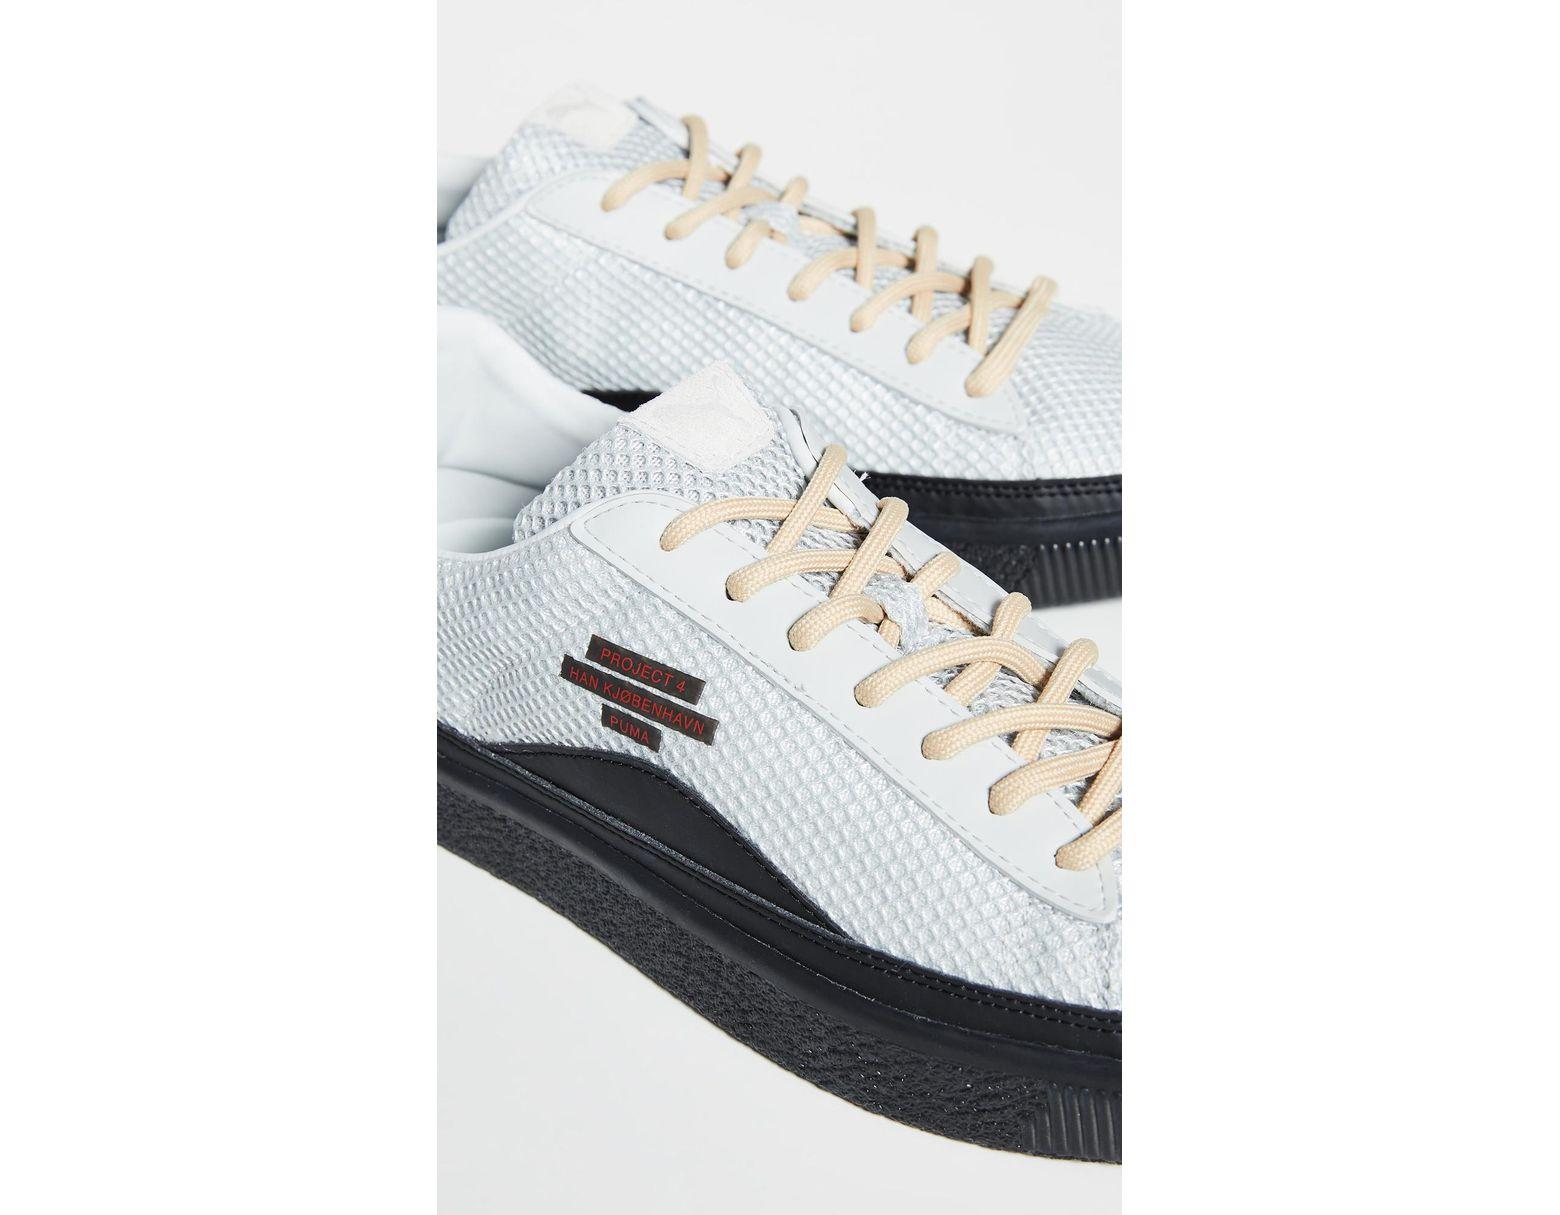 5100ec8b20 Puma Select X Han Kjobenhavn Clyde Sneakers for Men - Lyst